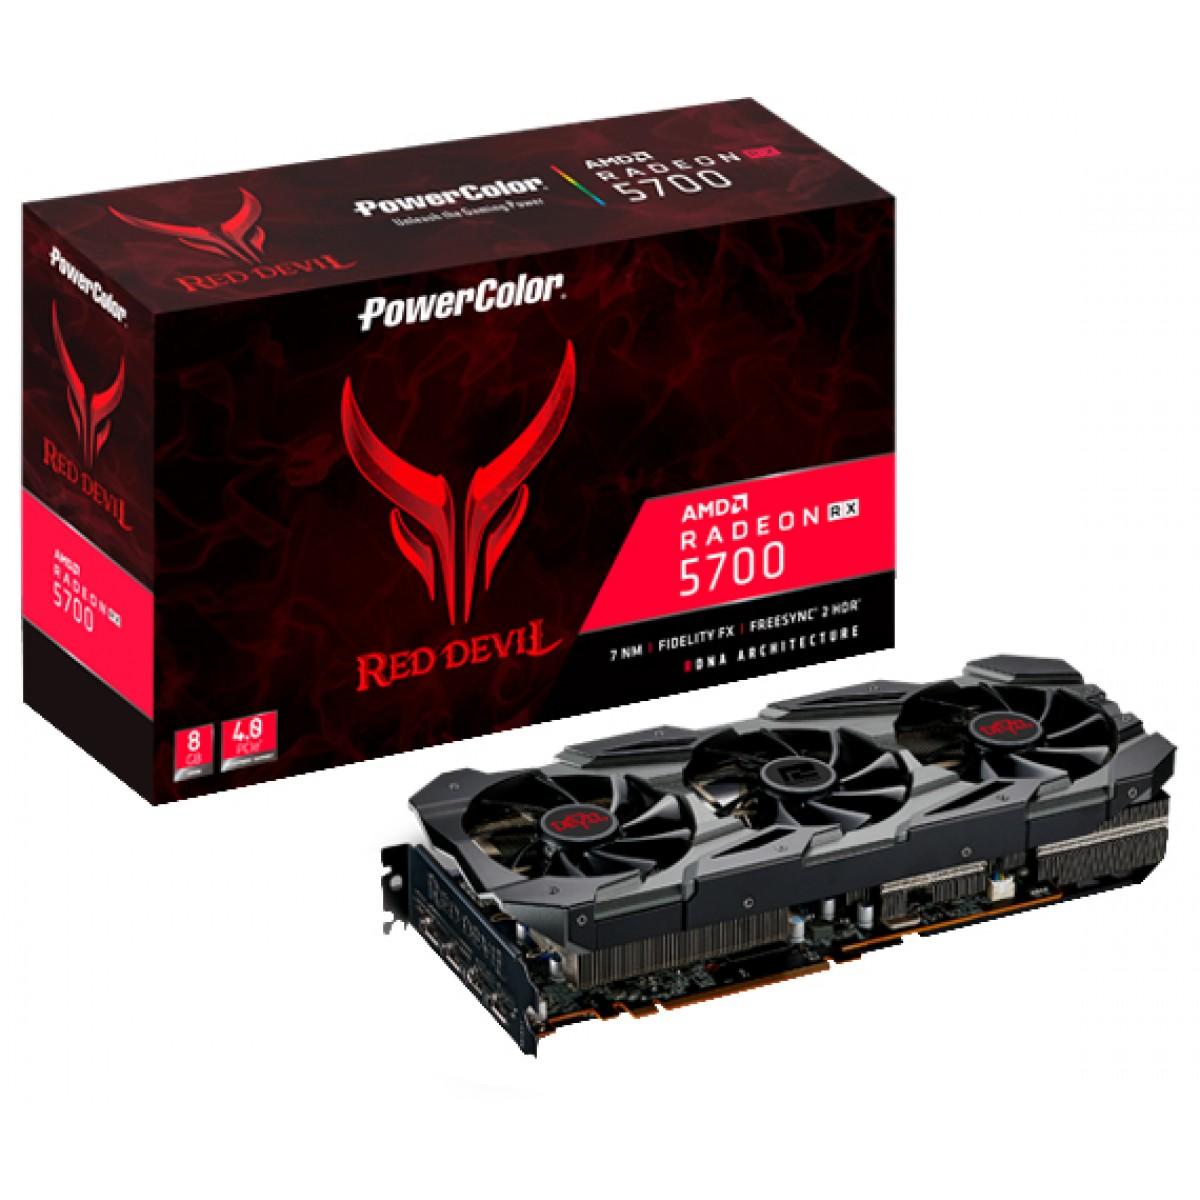 Placa de Vídeo PowerColor Radeon Navi RX 5700 Red Devil, 8GB GDDR6, 256Bit, AXRX 5700 8GBD6-3DHE/OC - Open Box